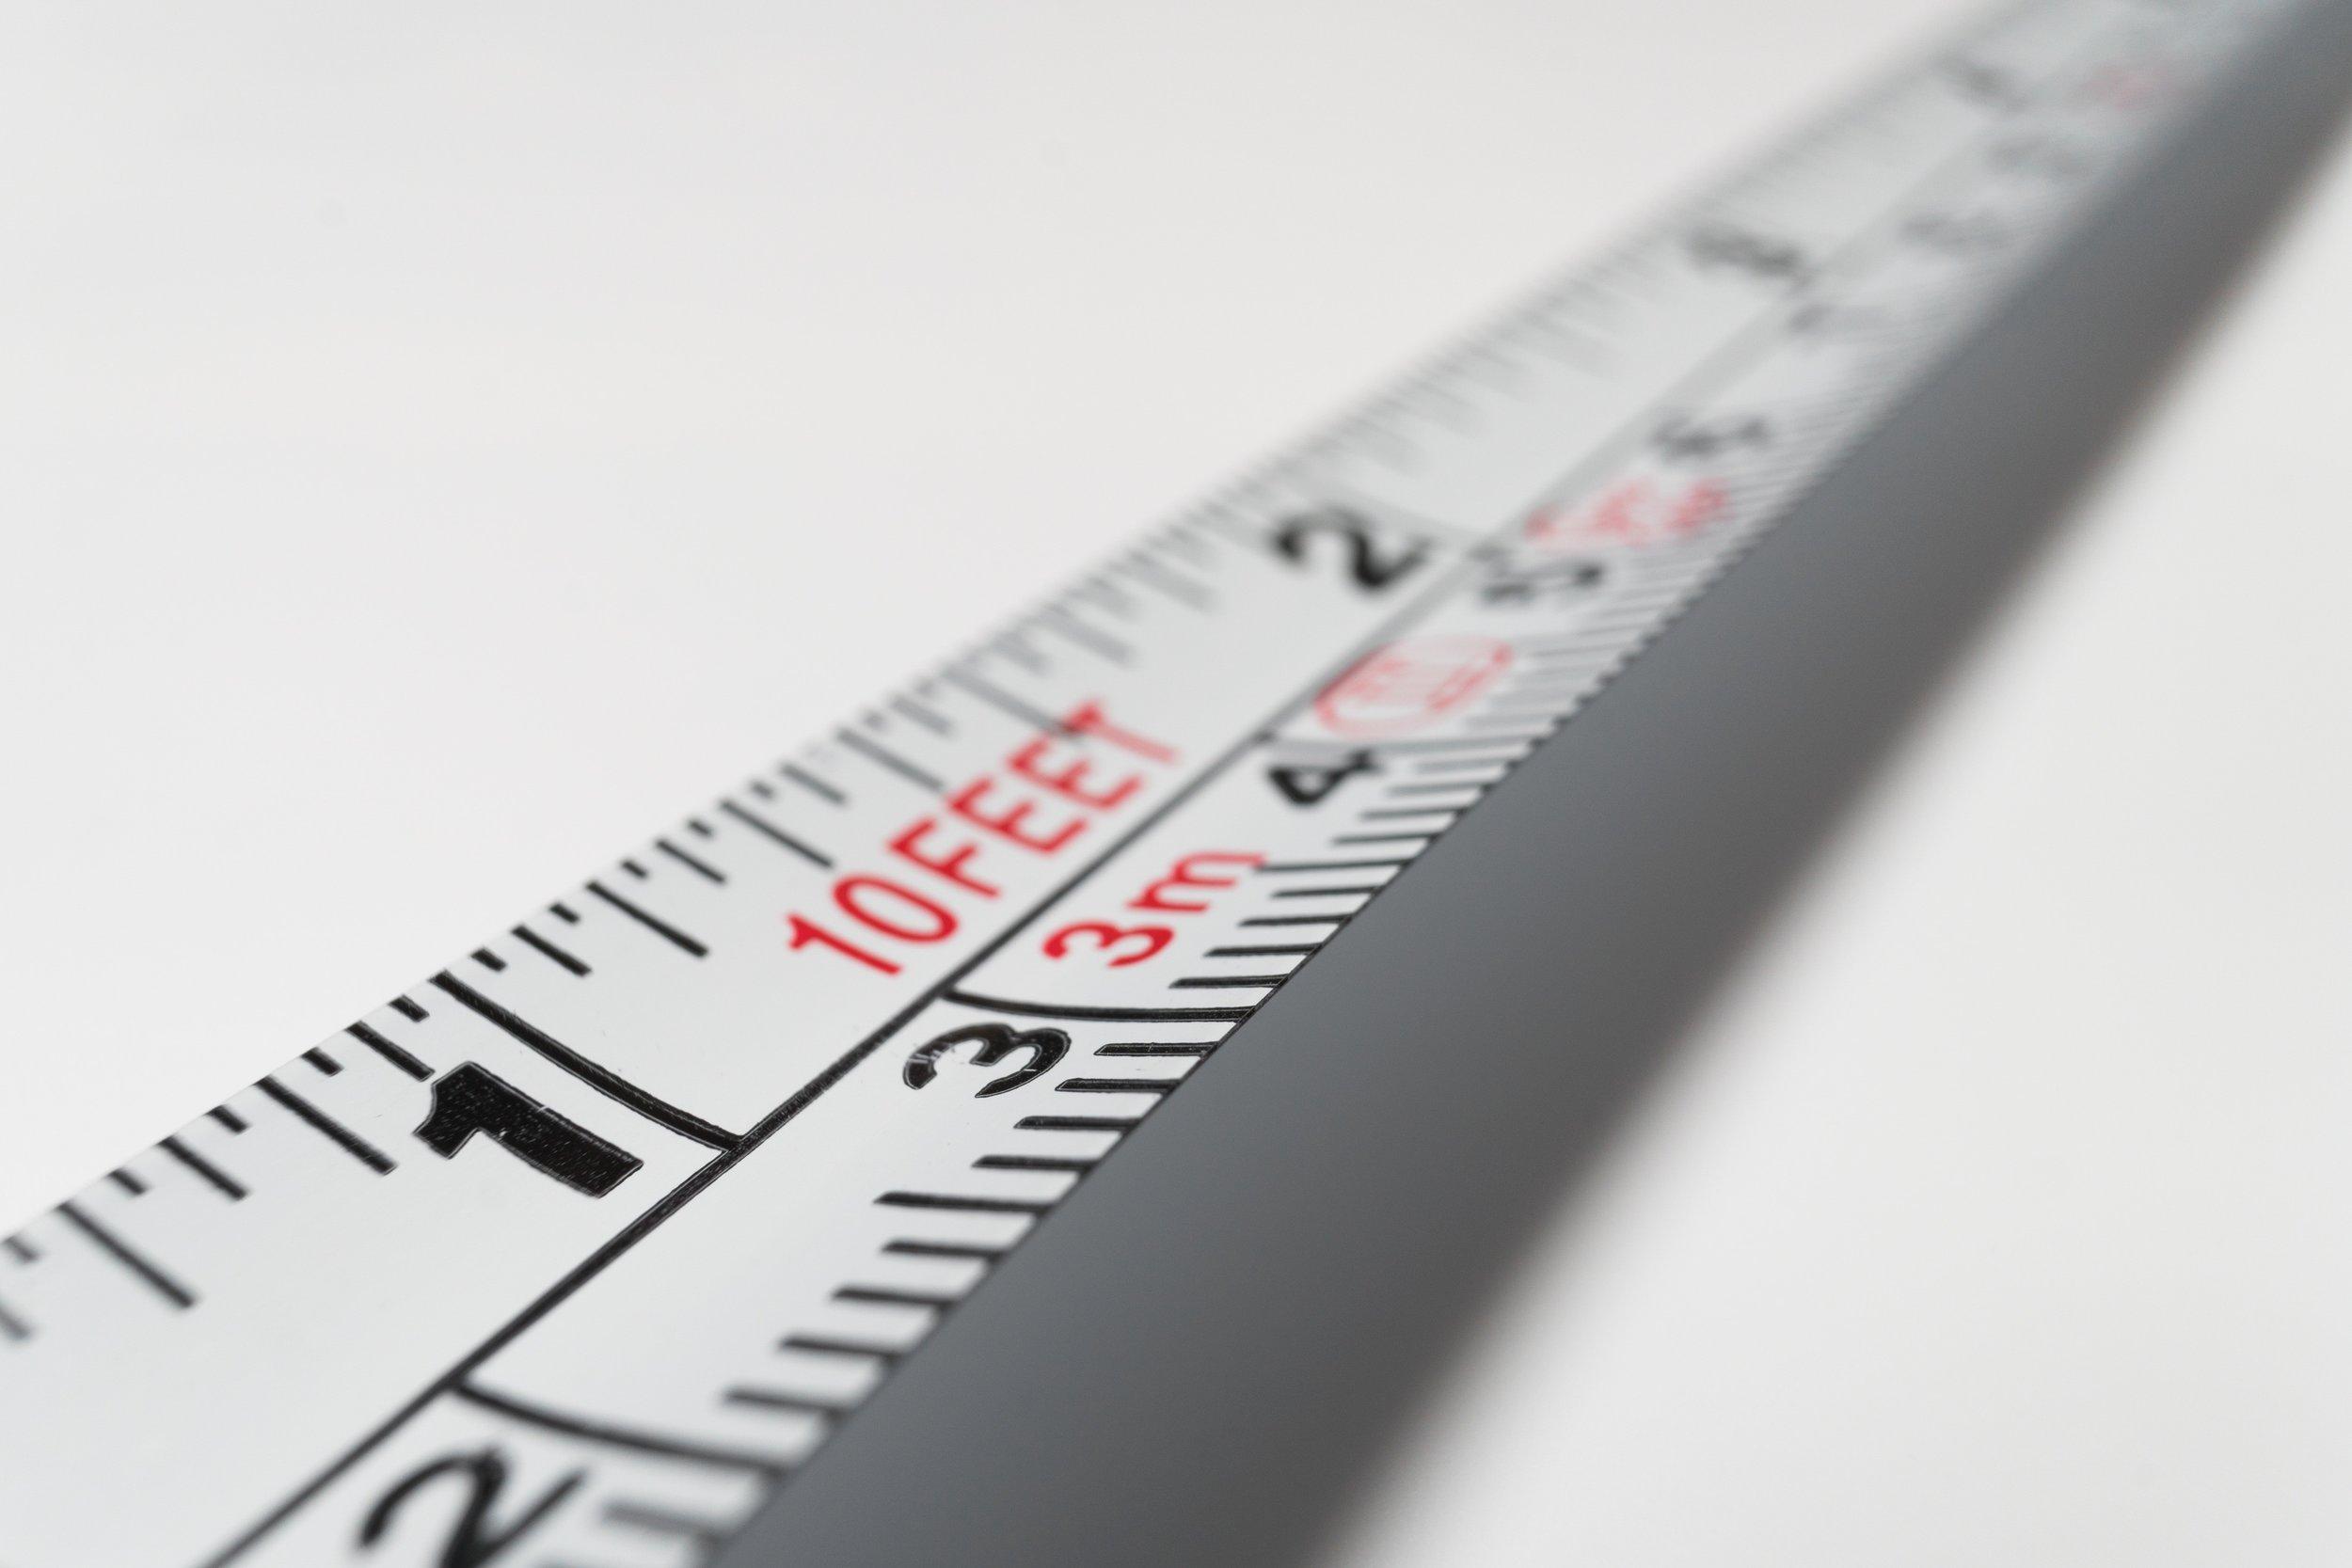 Measuring Square Feet